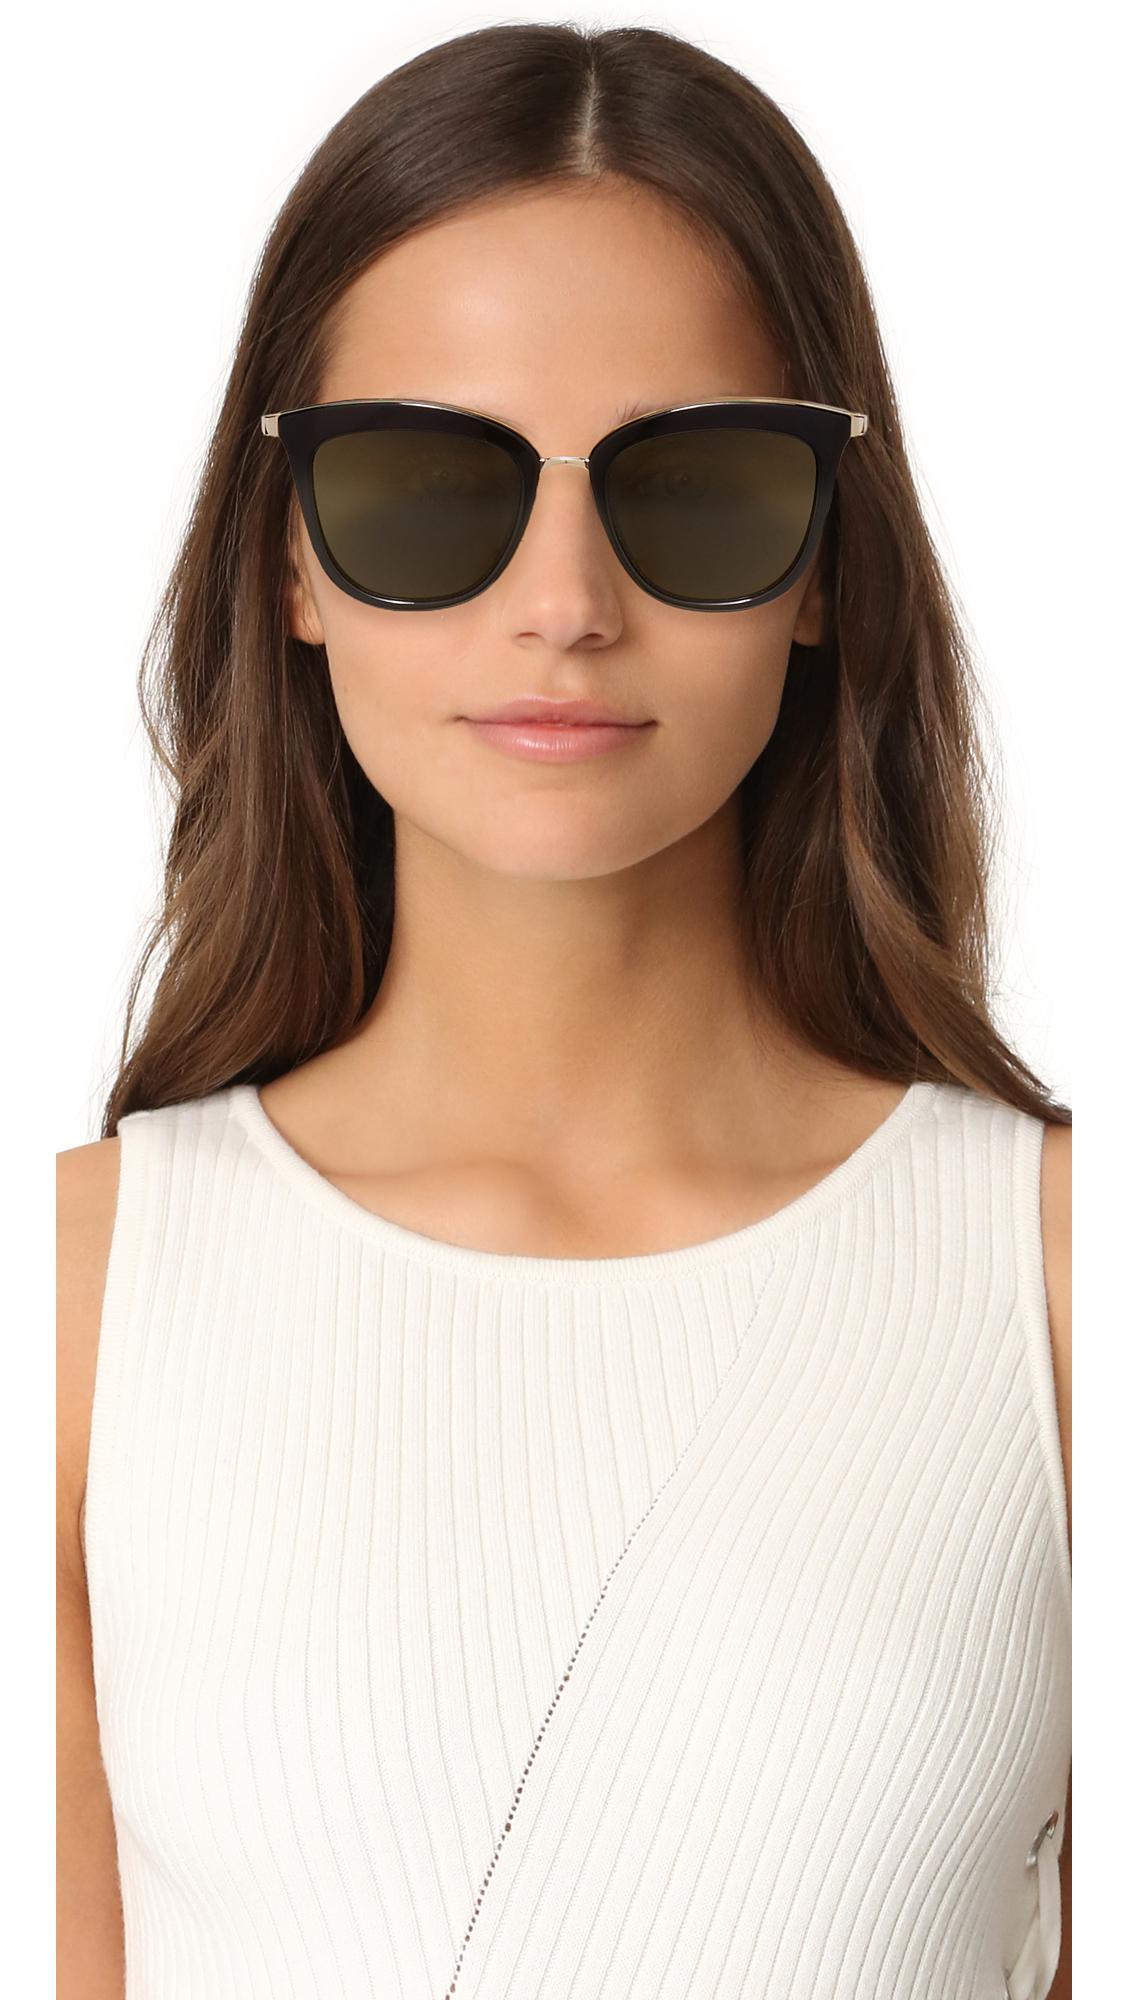 97720a72b99 Lyst - Le Specs Caliente Sunglasses in Natural